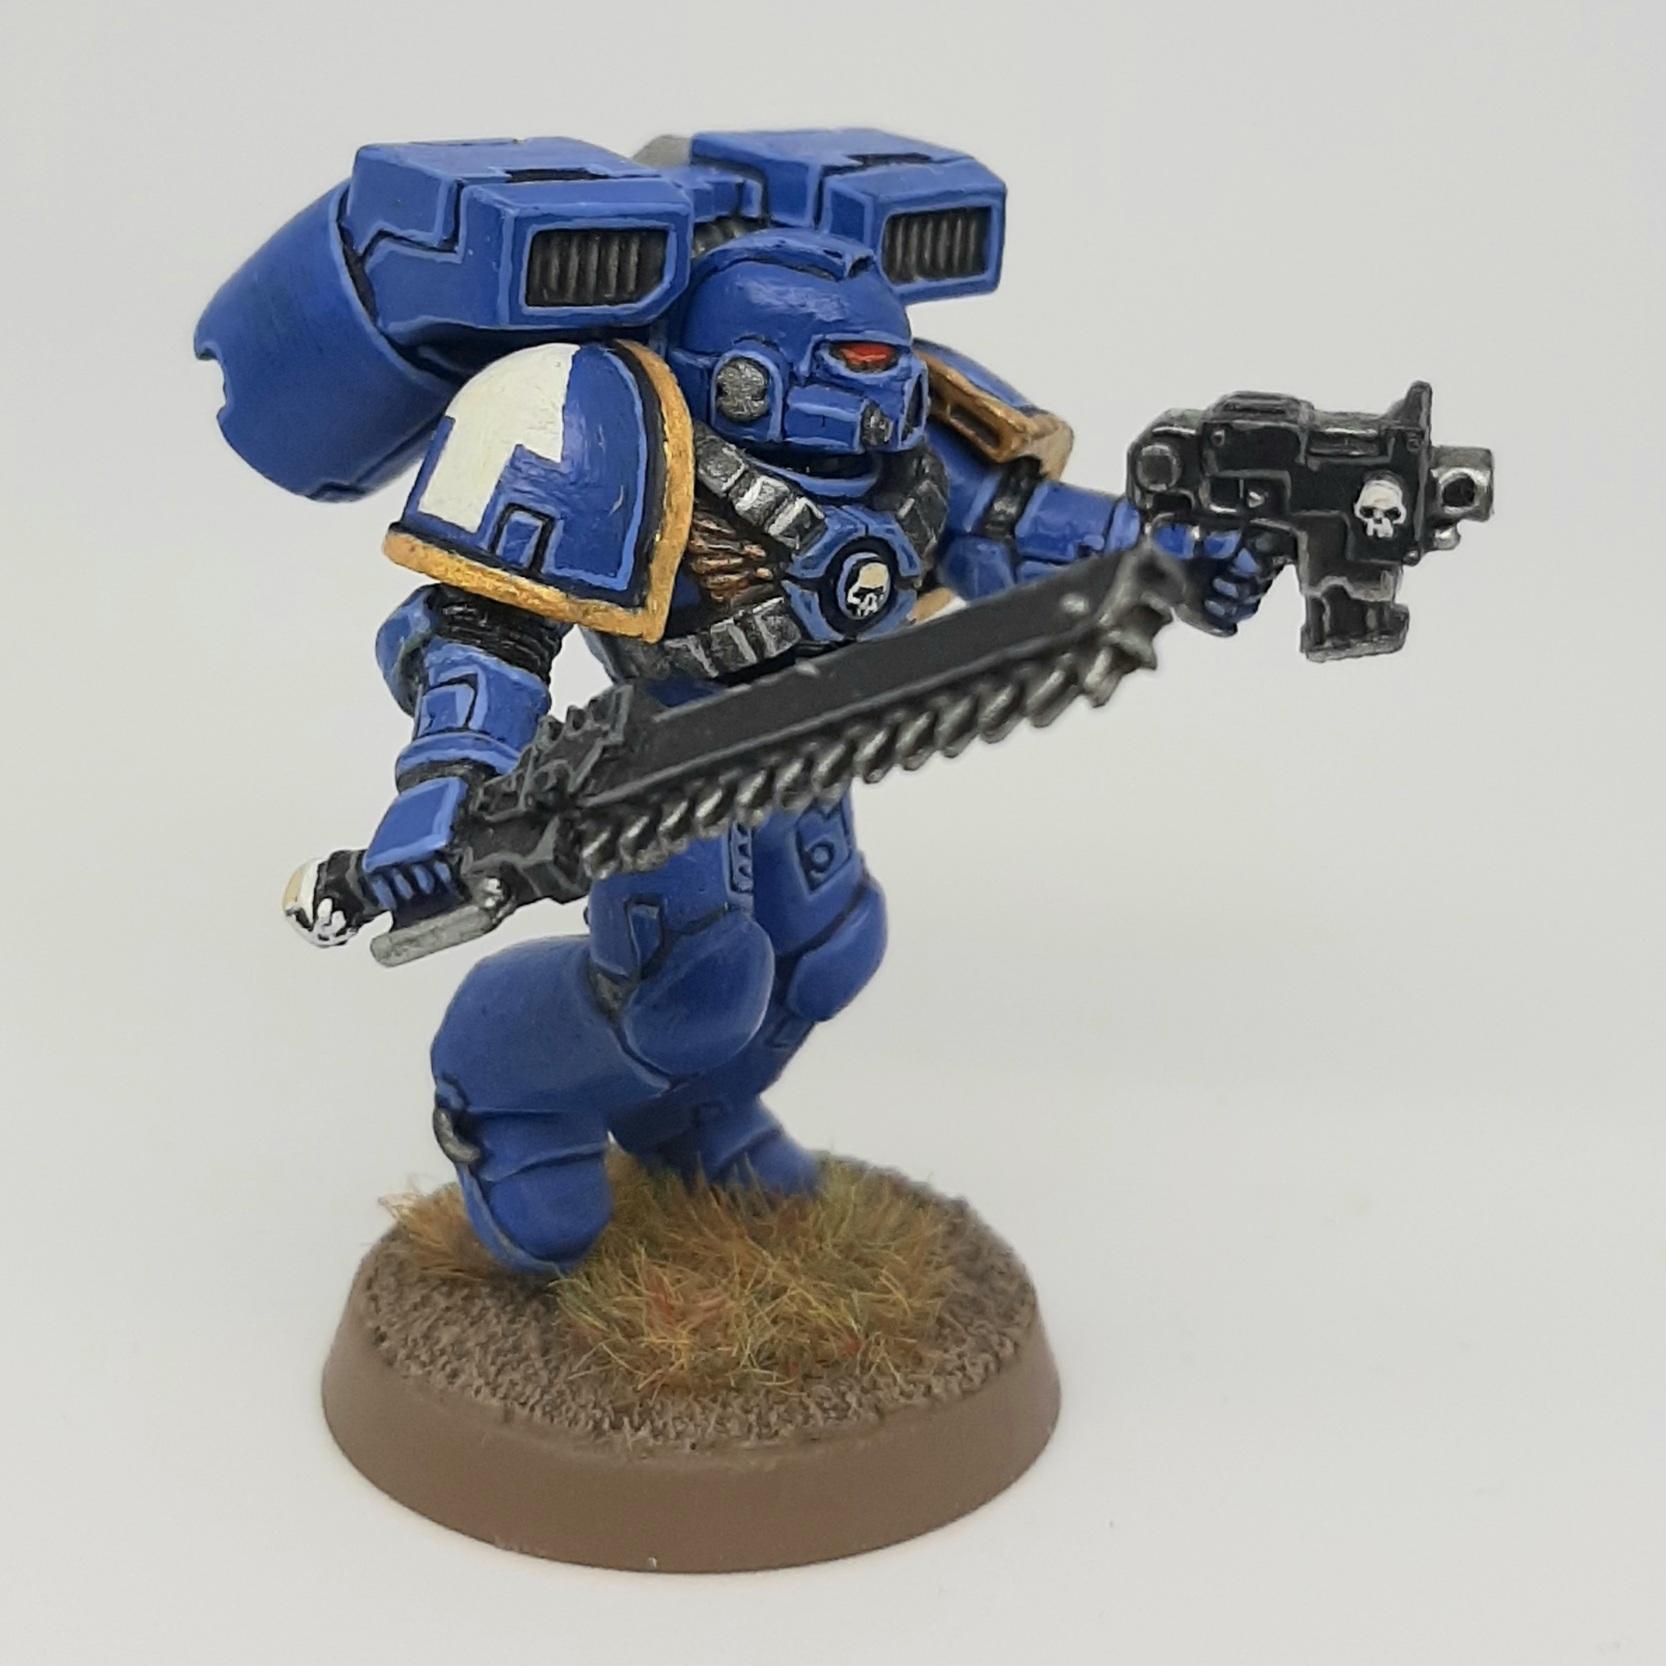 Assault, Bolt, Chainsword, Conversion, Custom, Kitbash, Pistol, Space Marines, Ultramarines